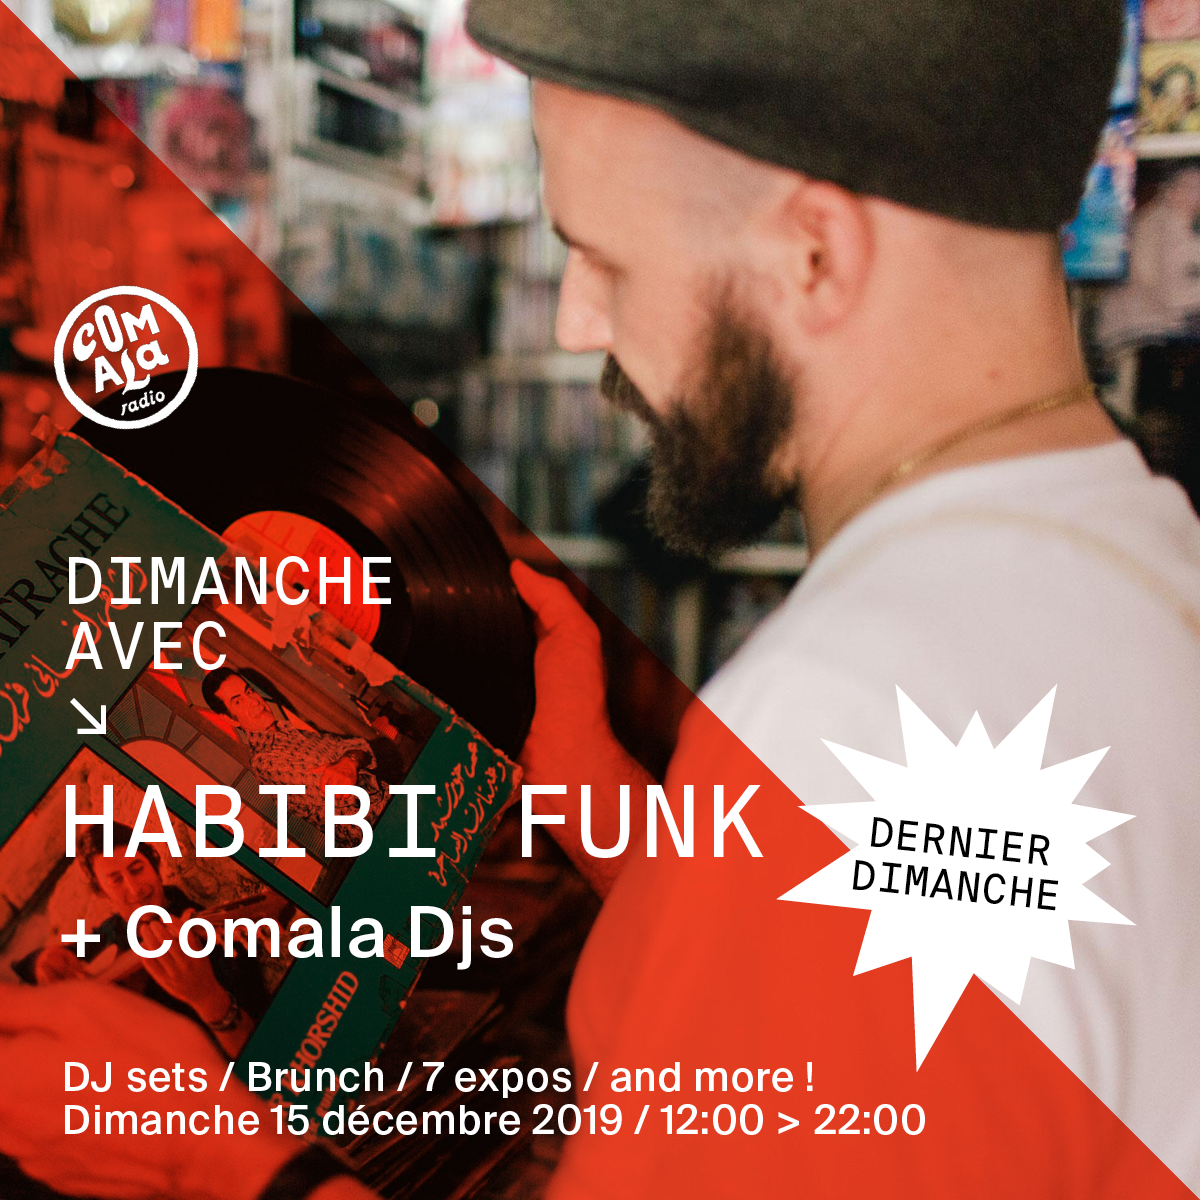 Dimanche avec Habibi Funk & Comala DJs